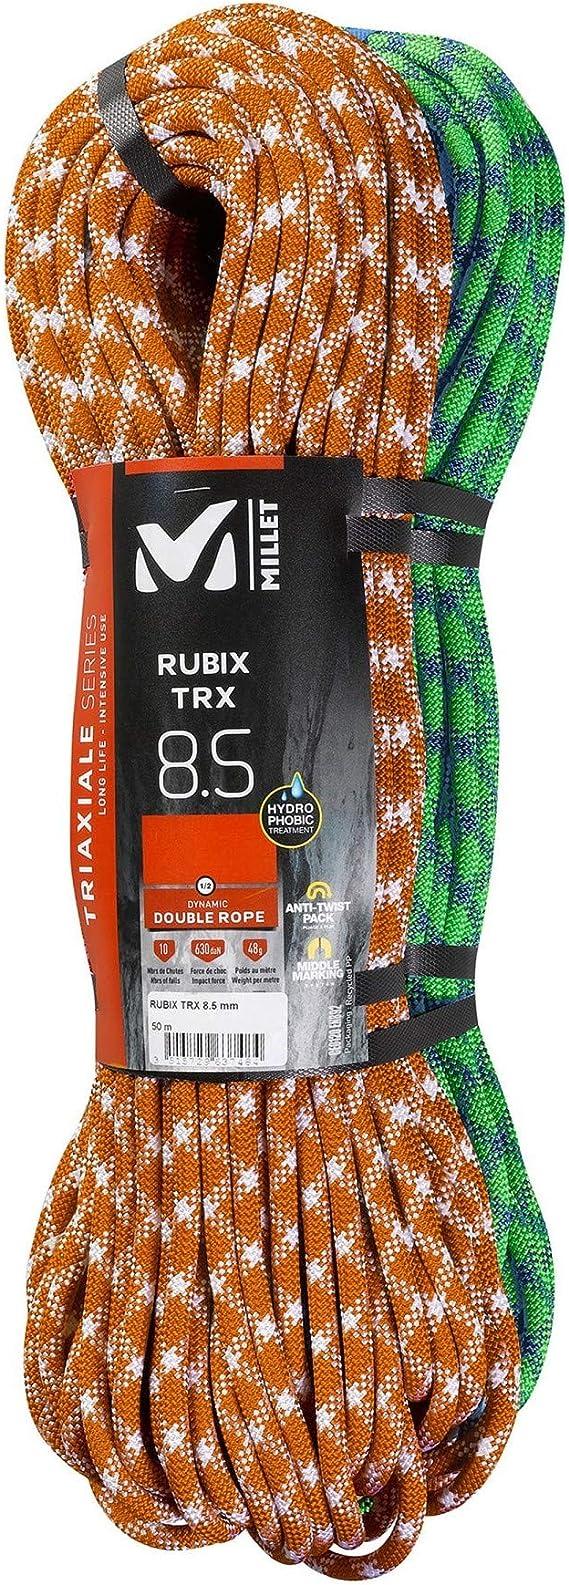 MILLET MIX1782 Cuerda, Unisex-Adult, Vert/Orange, Unico ...